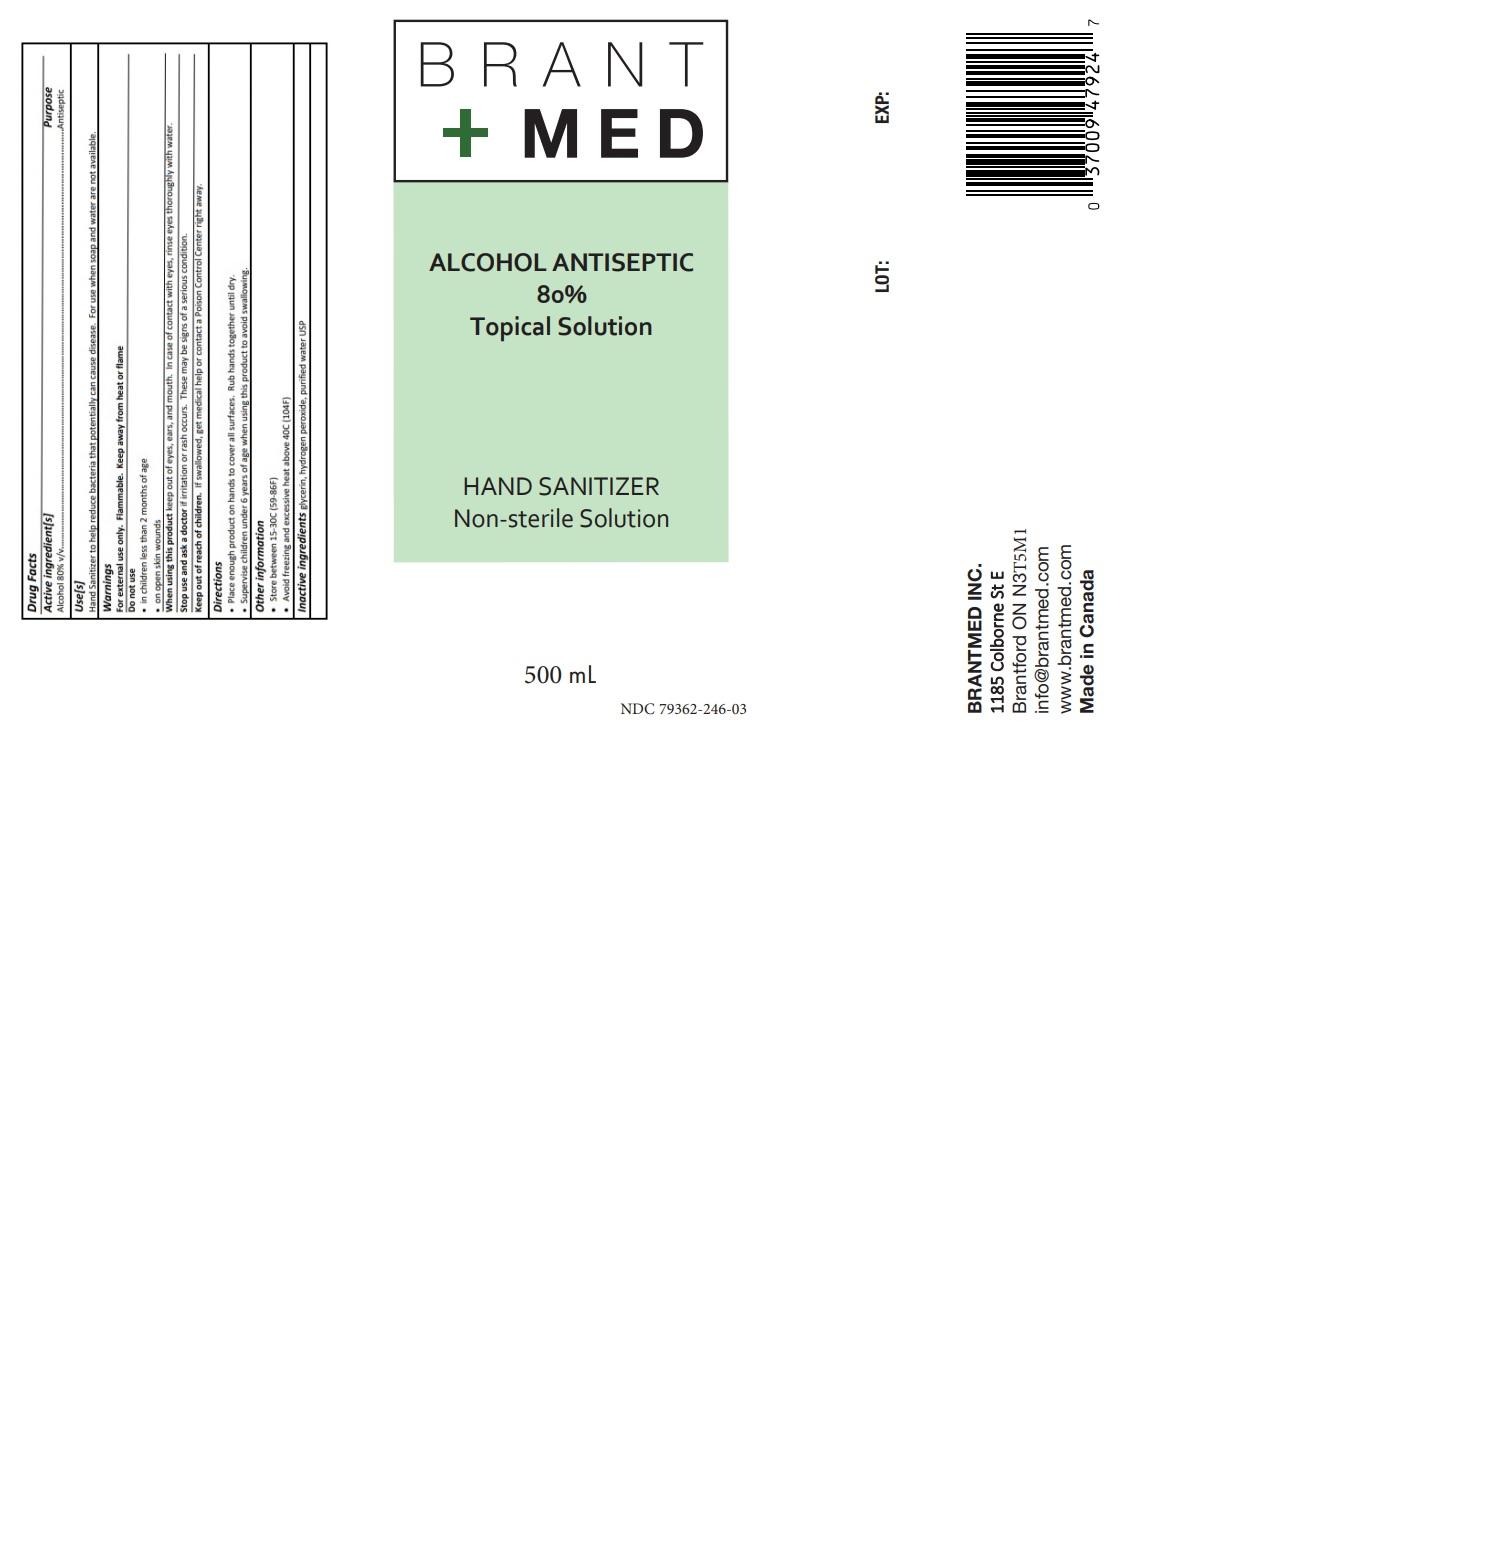 500 ml label